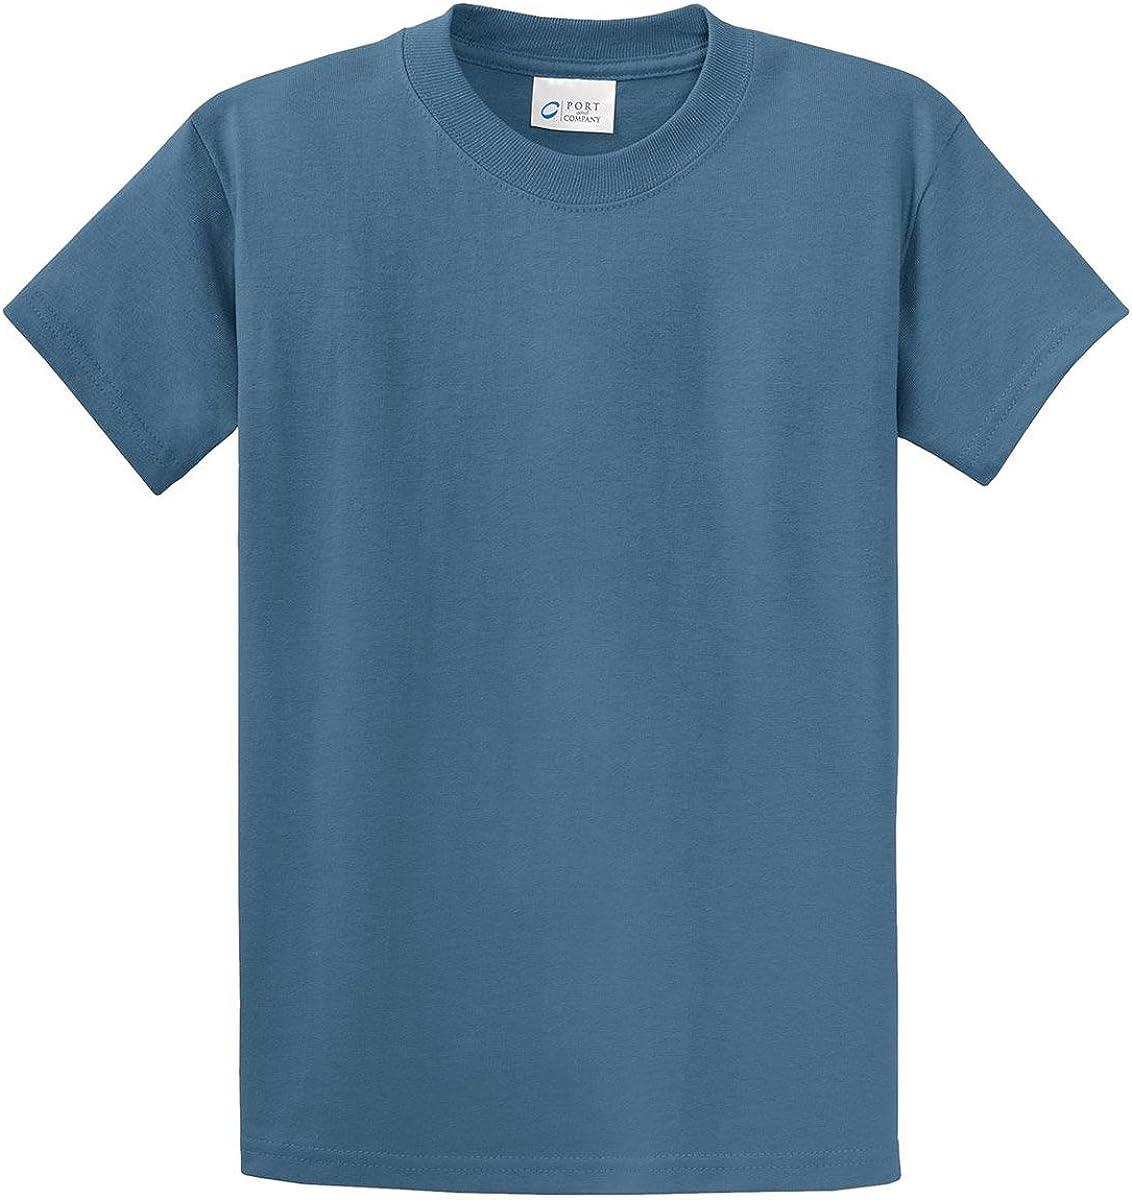 Port & Company Tall Essential T-Shirt-4XLT (Sand),4X Tall,Athletic Heather